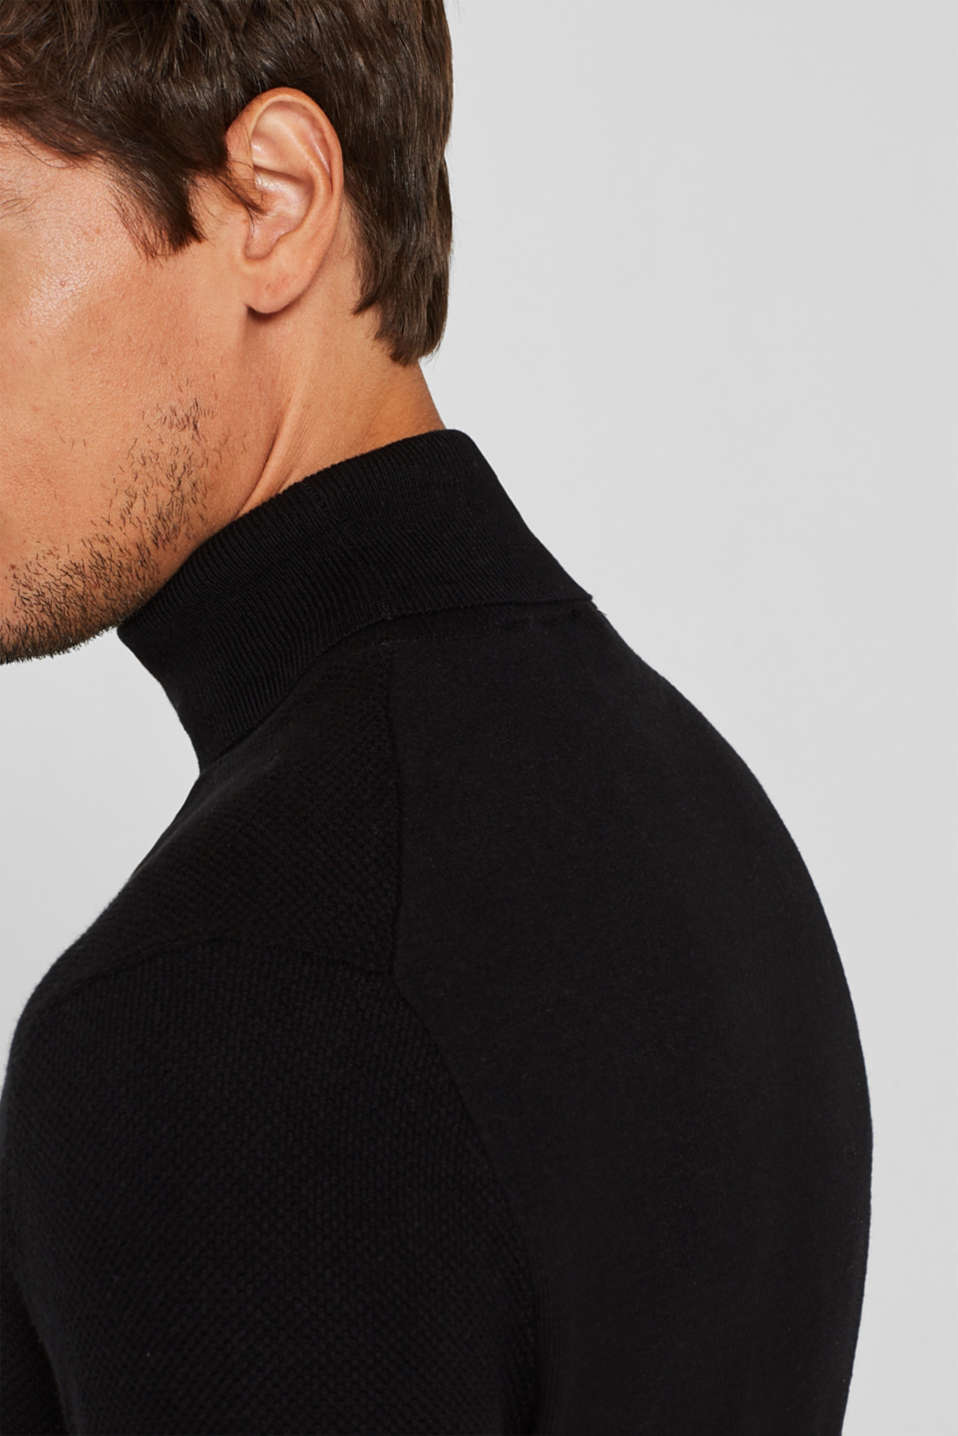 Polo neck jumper, 100% cotton, BLACK, detail image number 2